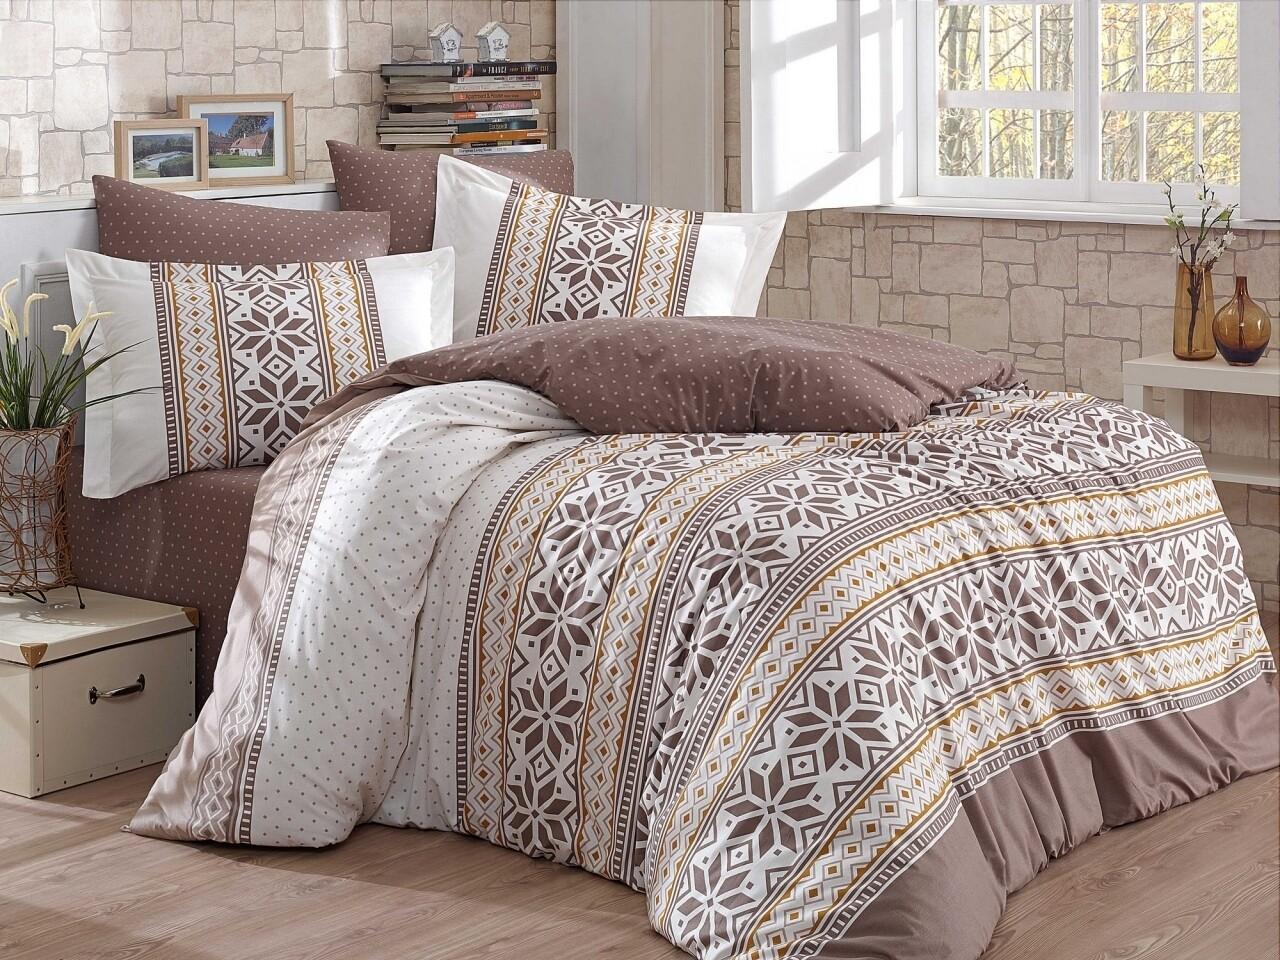 Lenjerie de pat pentru o persoana, 3 piese, 100% bumbac poplin, Hobby, Carla, maro/bej